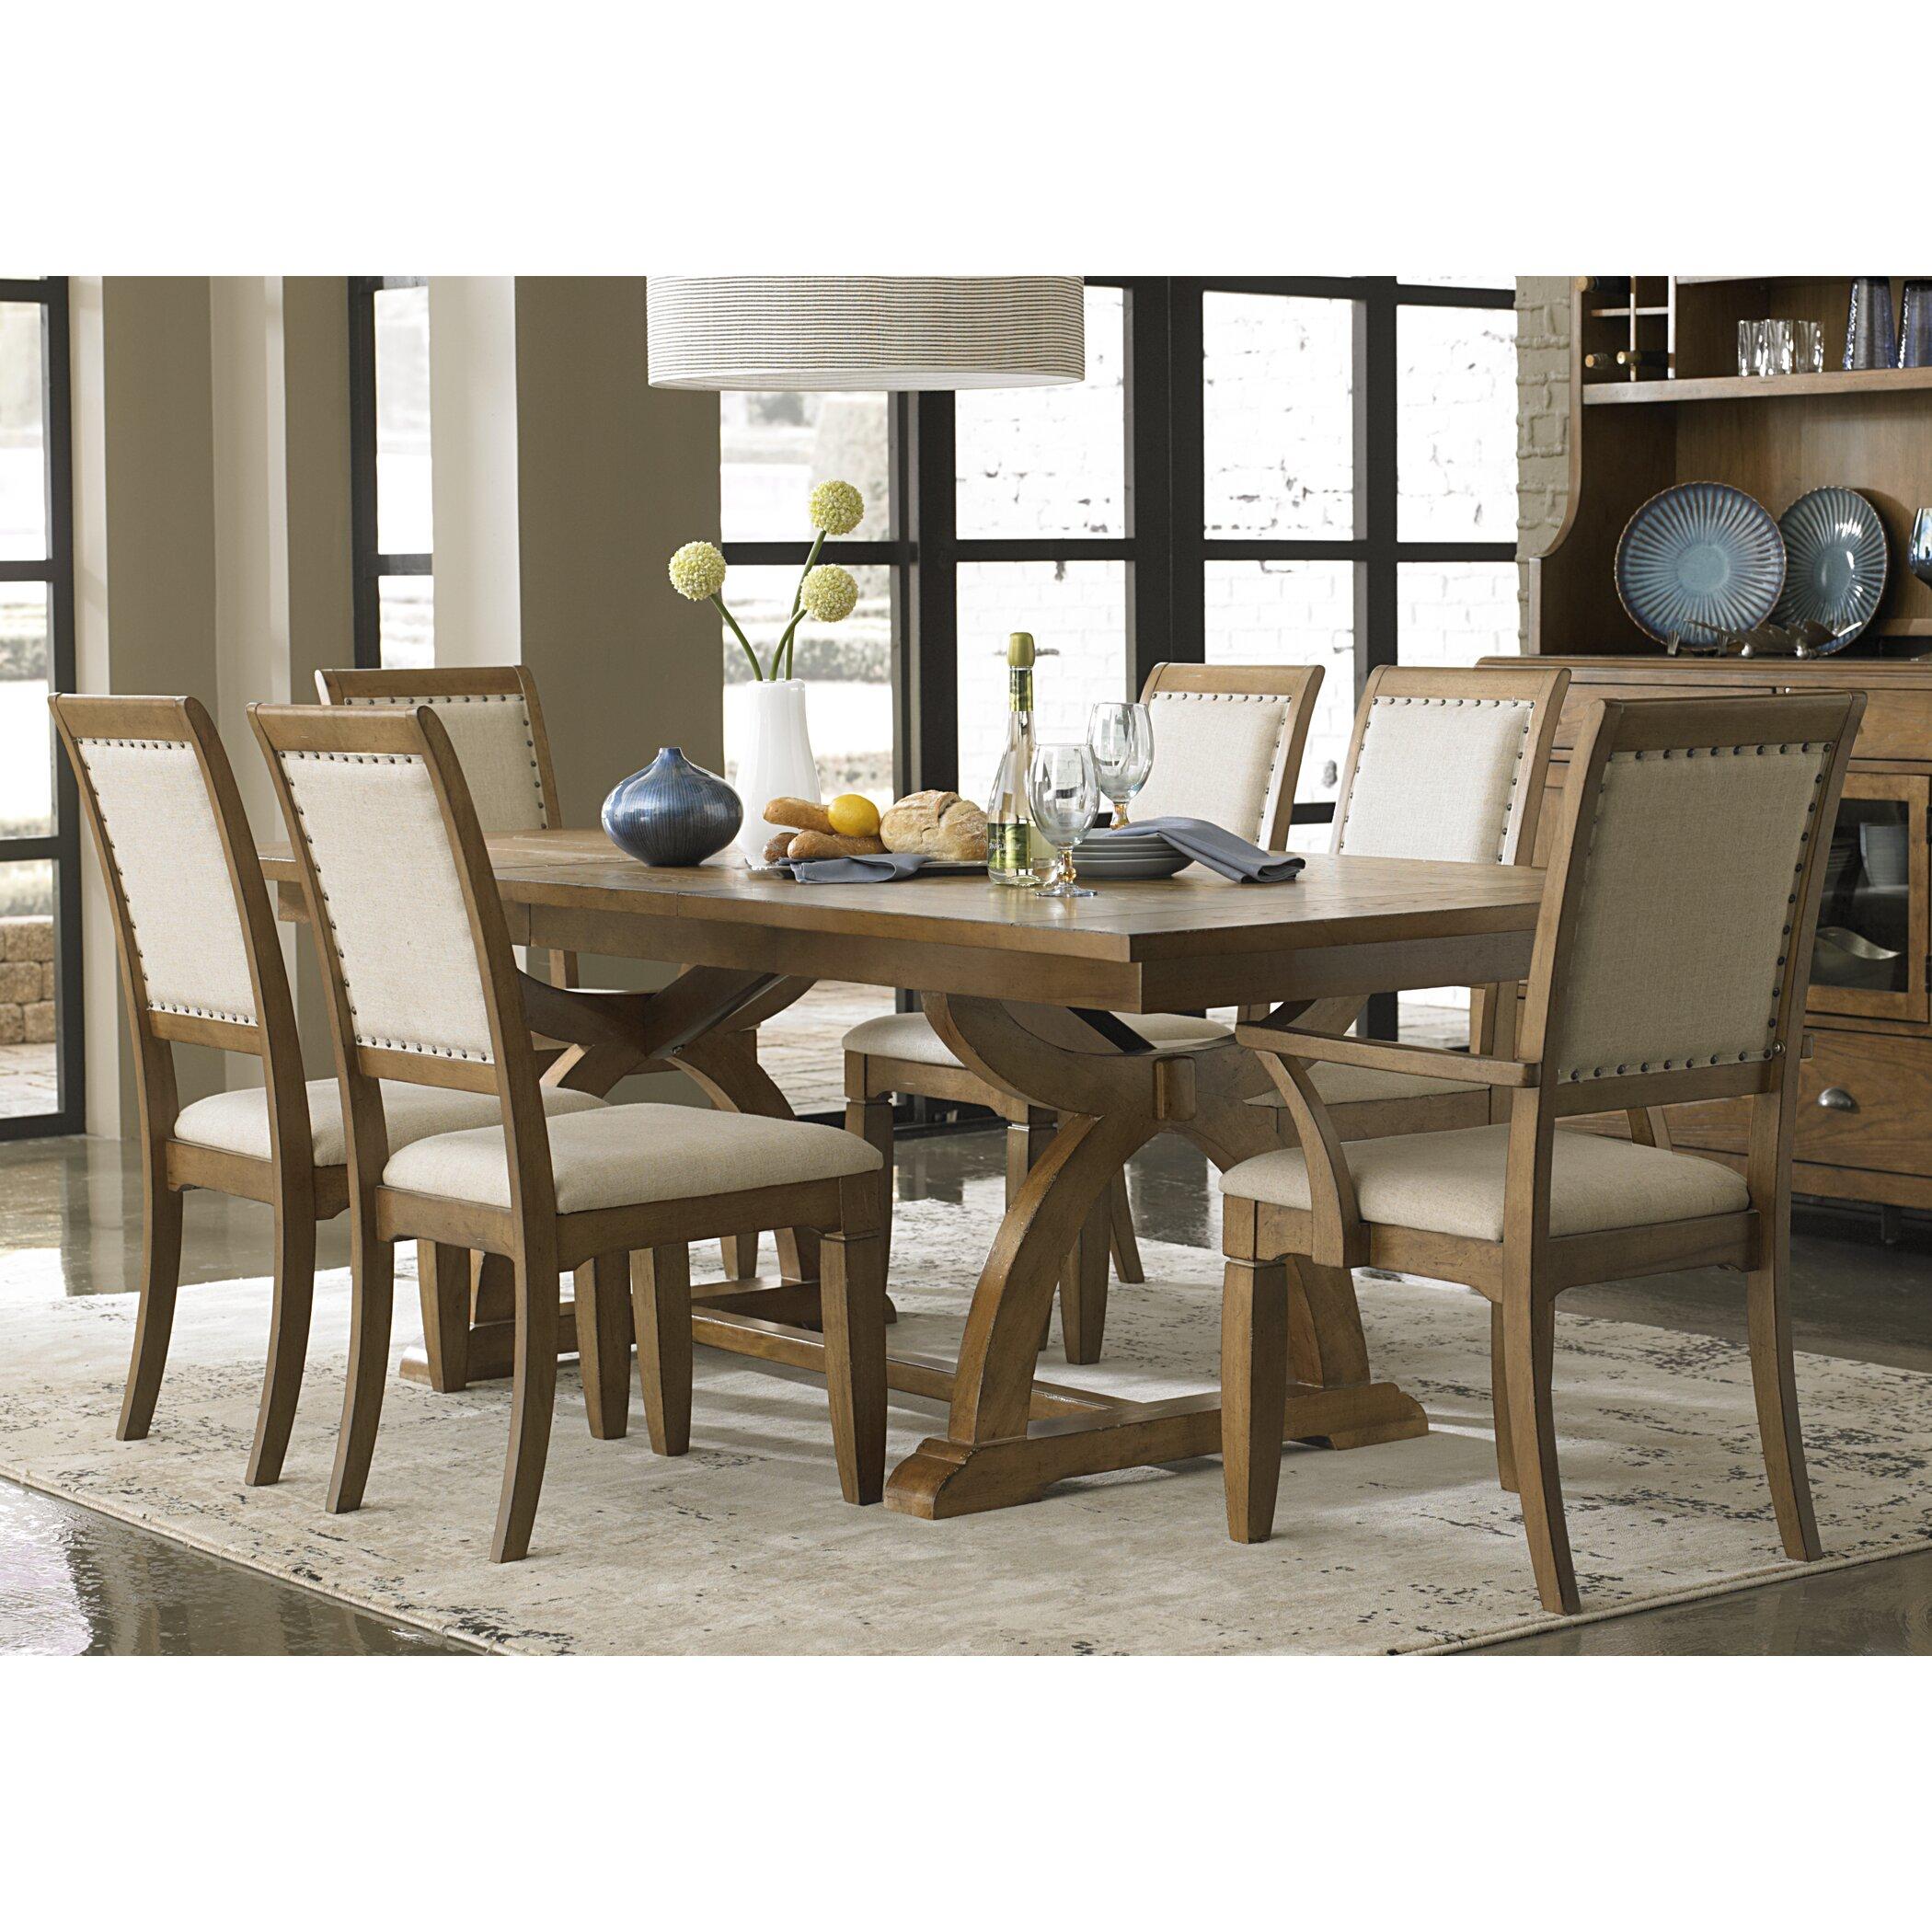 Lark manor 9 piece dining set reviews wayfair for 9 piece dining room furniture